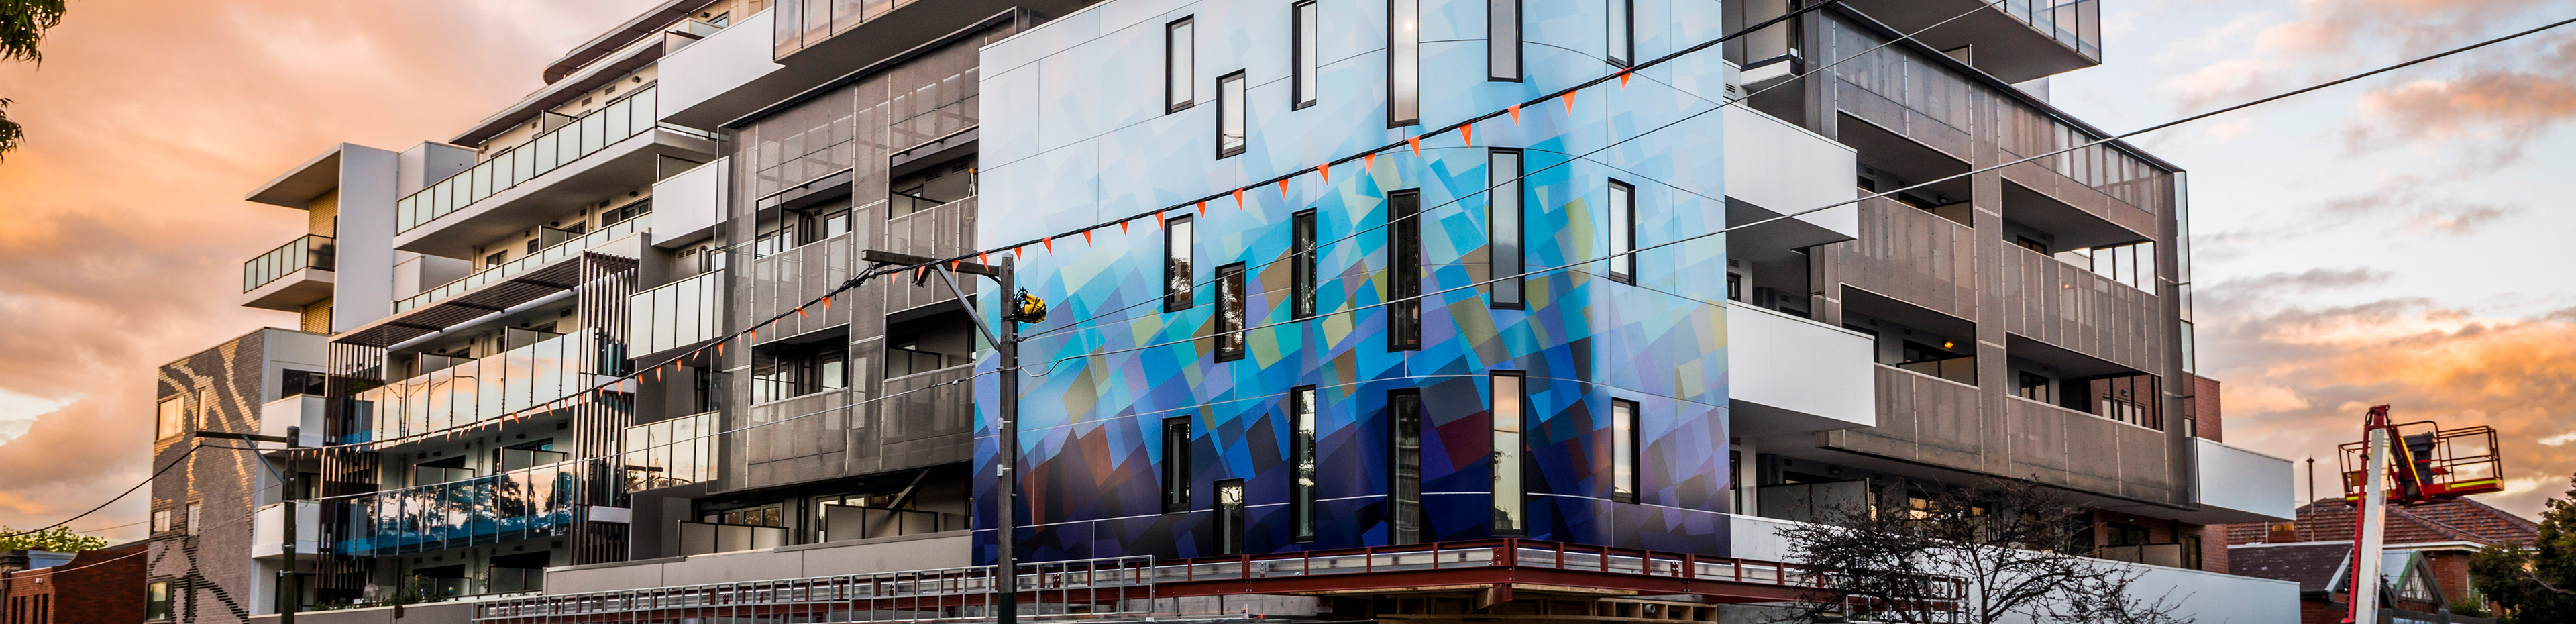 George Windsor ACM Facade Panels